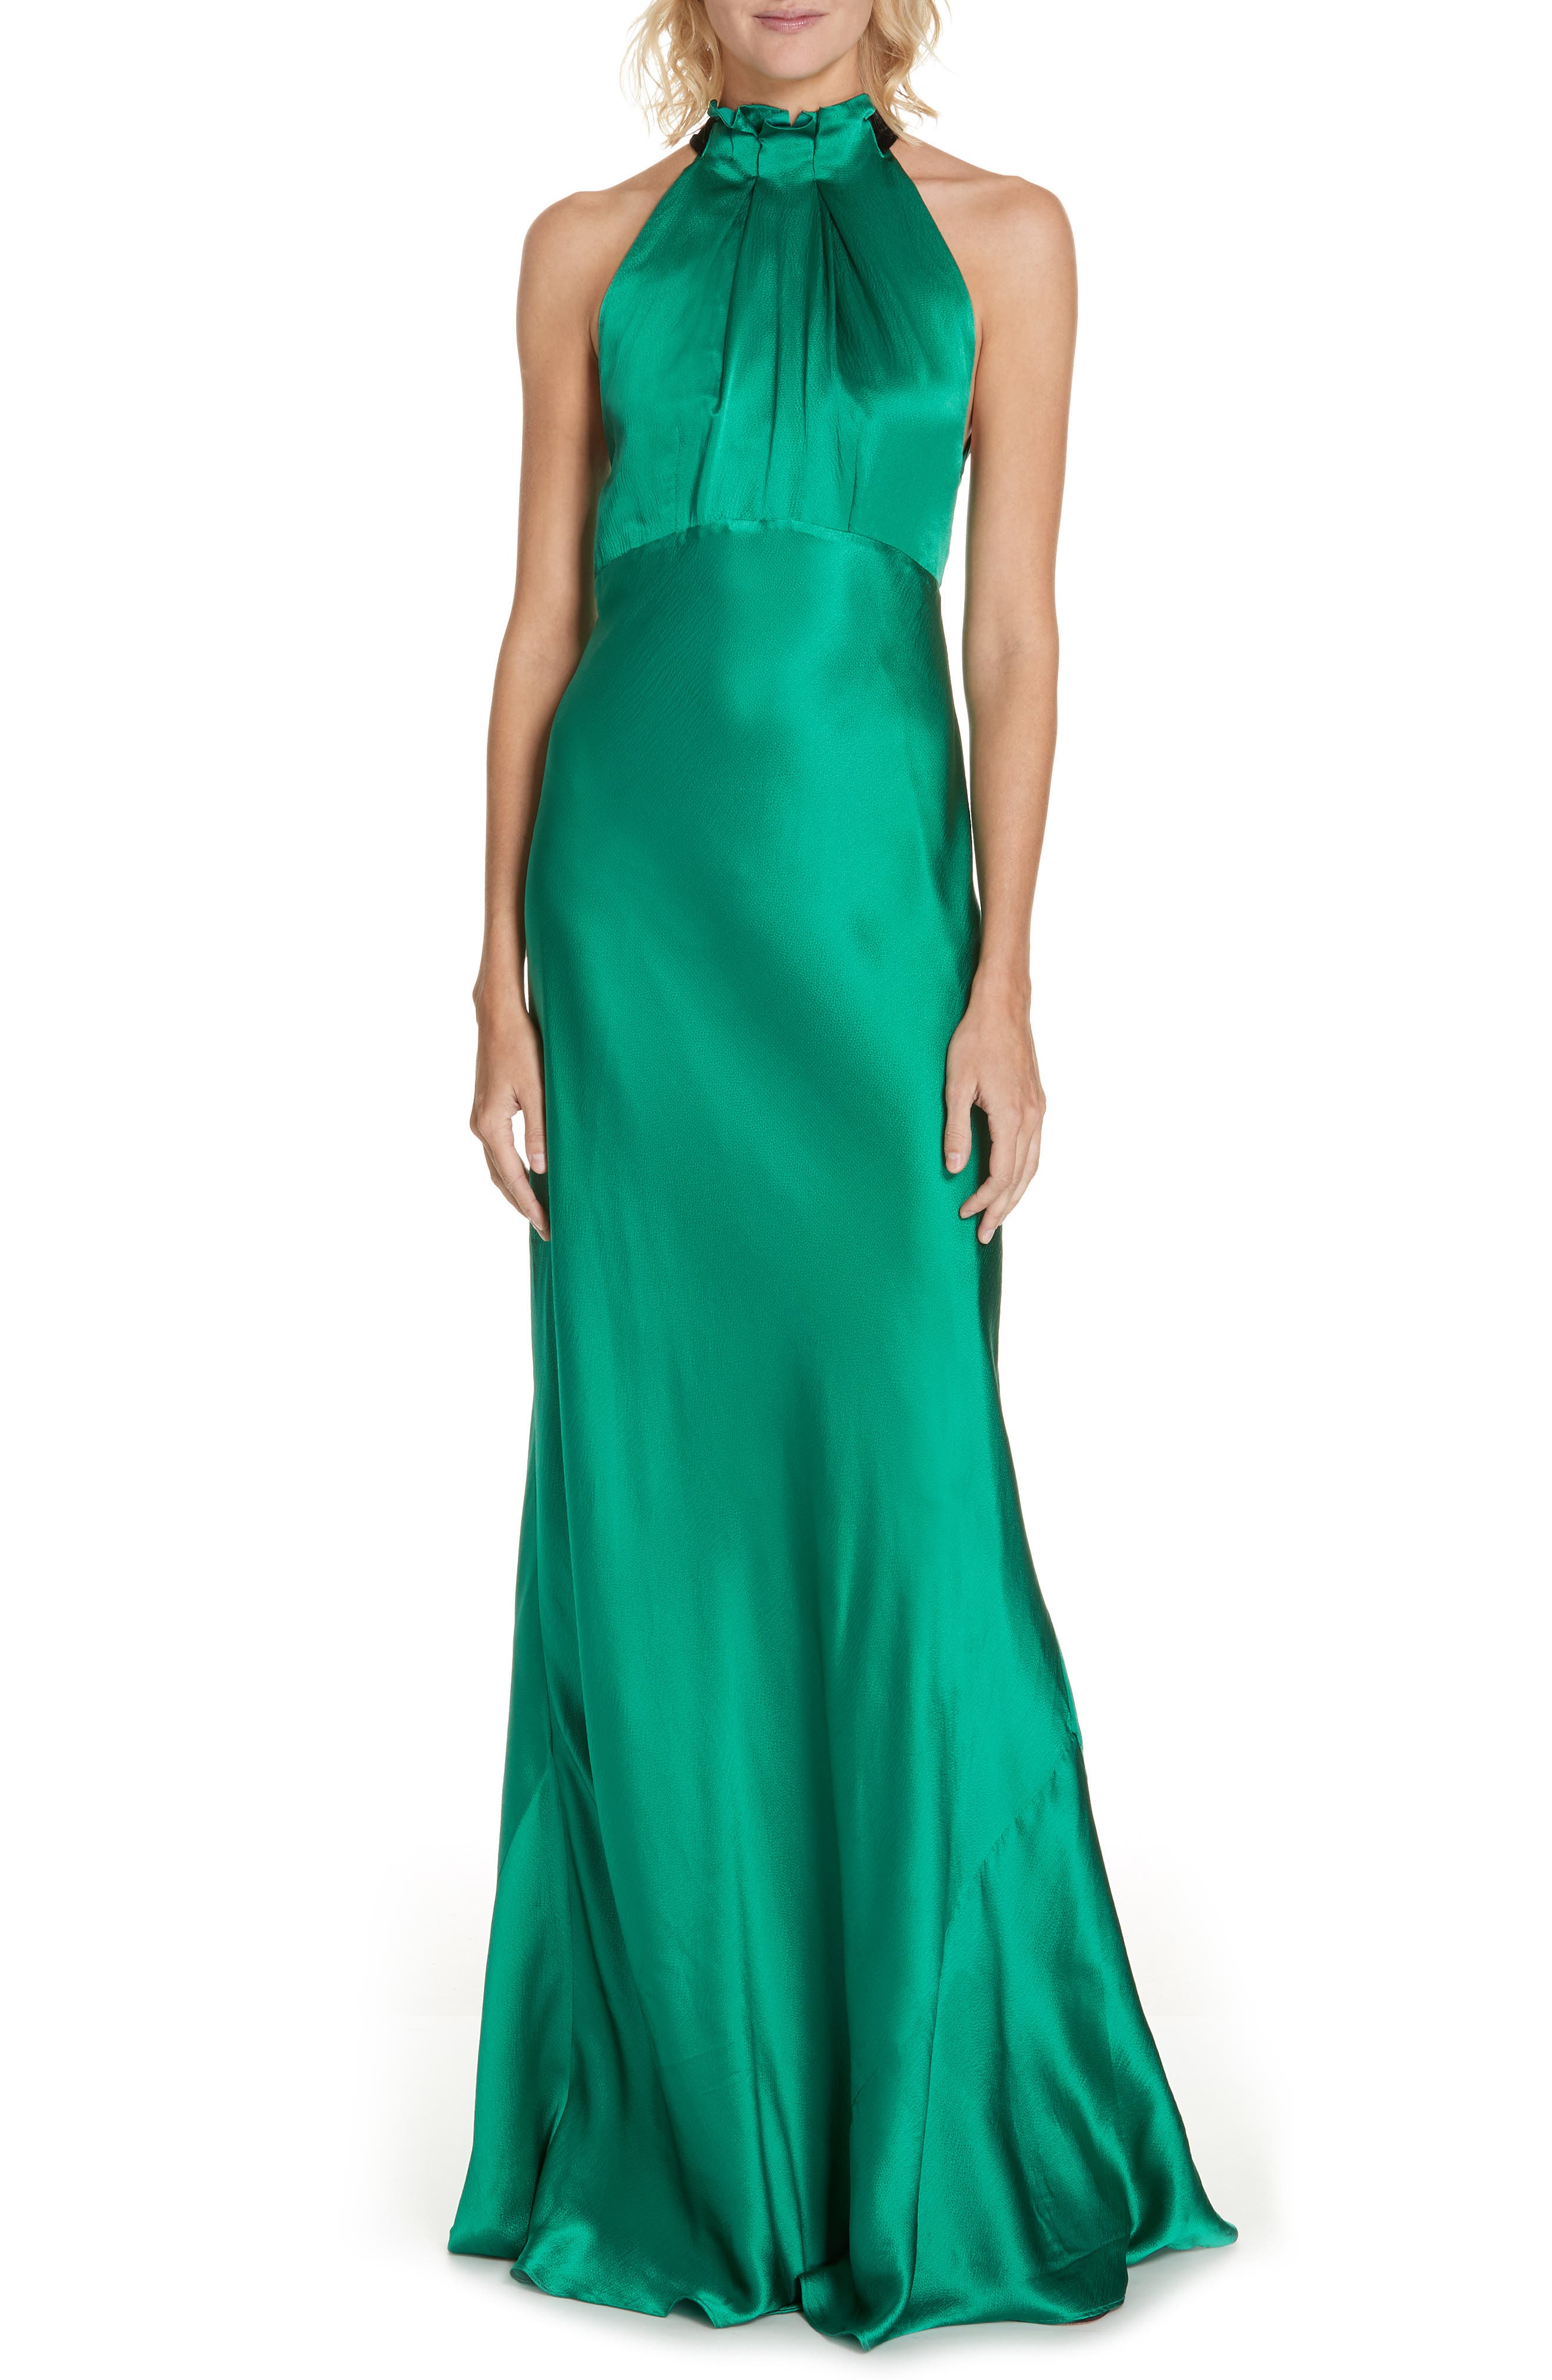 SALONI Michelle Velvet Bow Silk Halter Gown, Main, color, 310